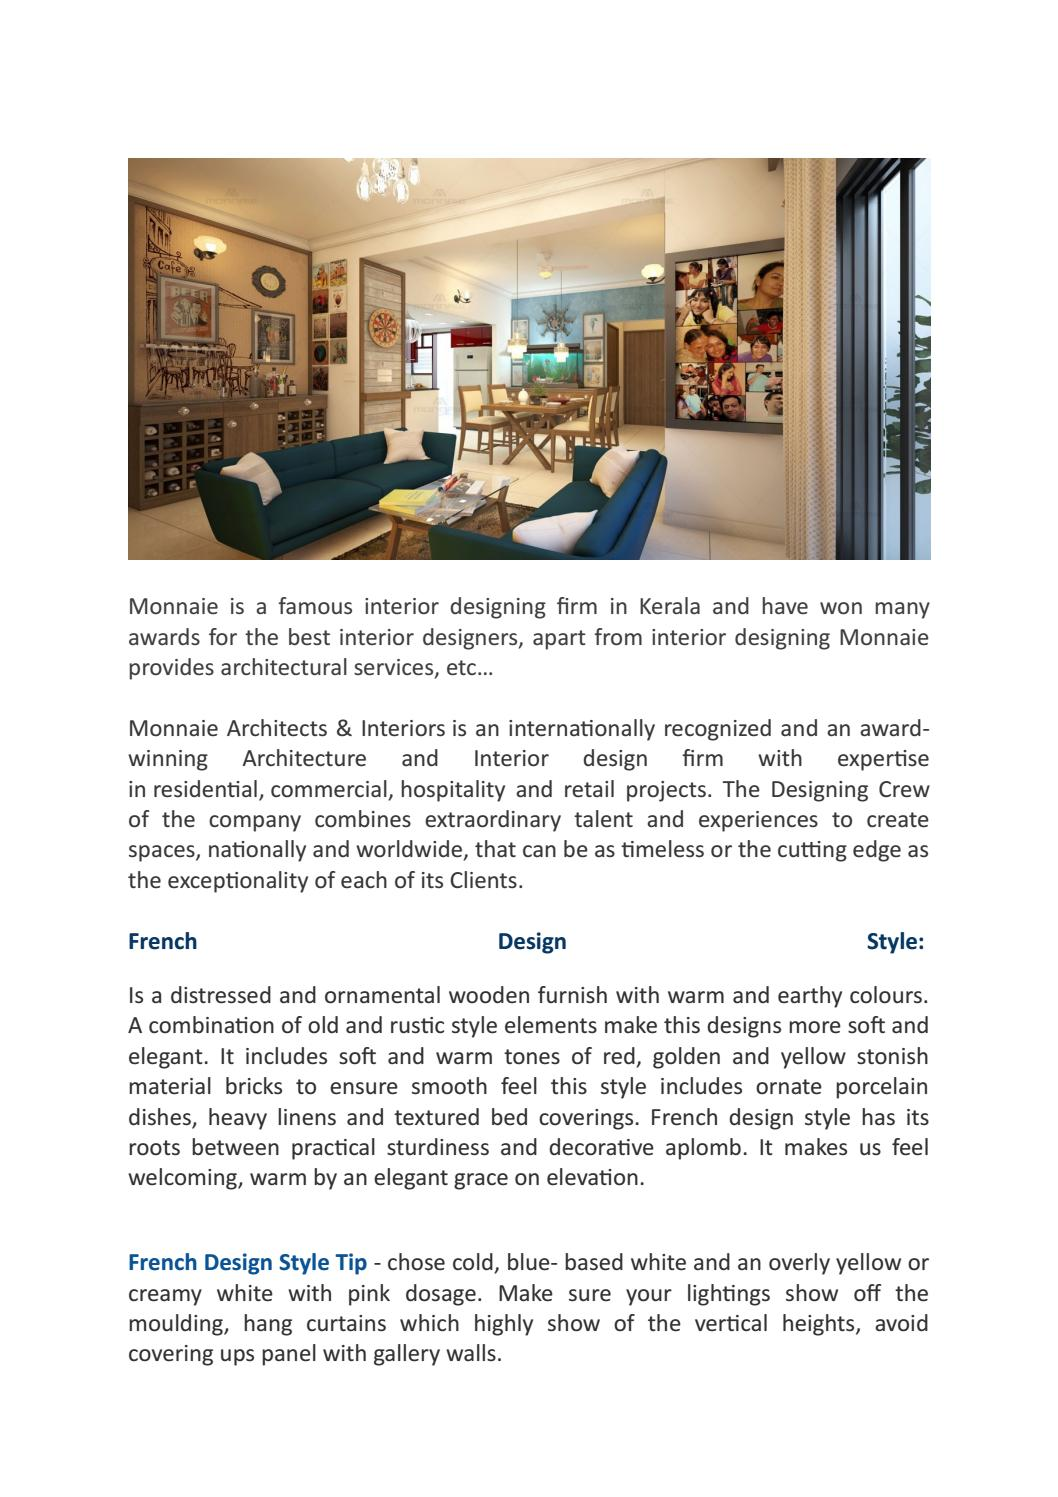 Multipurpose Interior Designing Firm Kerala By Monnaie Seo Issuu Moulding Company Santa Clara Crown Moulding Company houzz 01 The Moulding Company